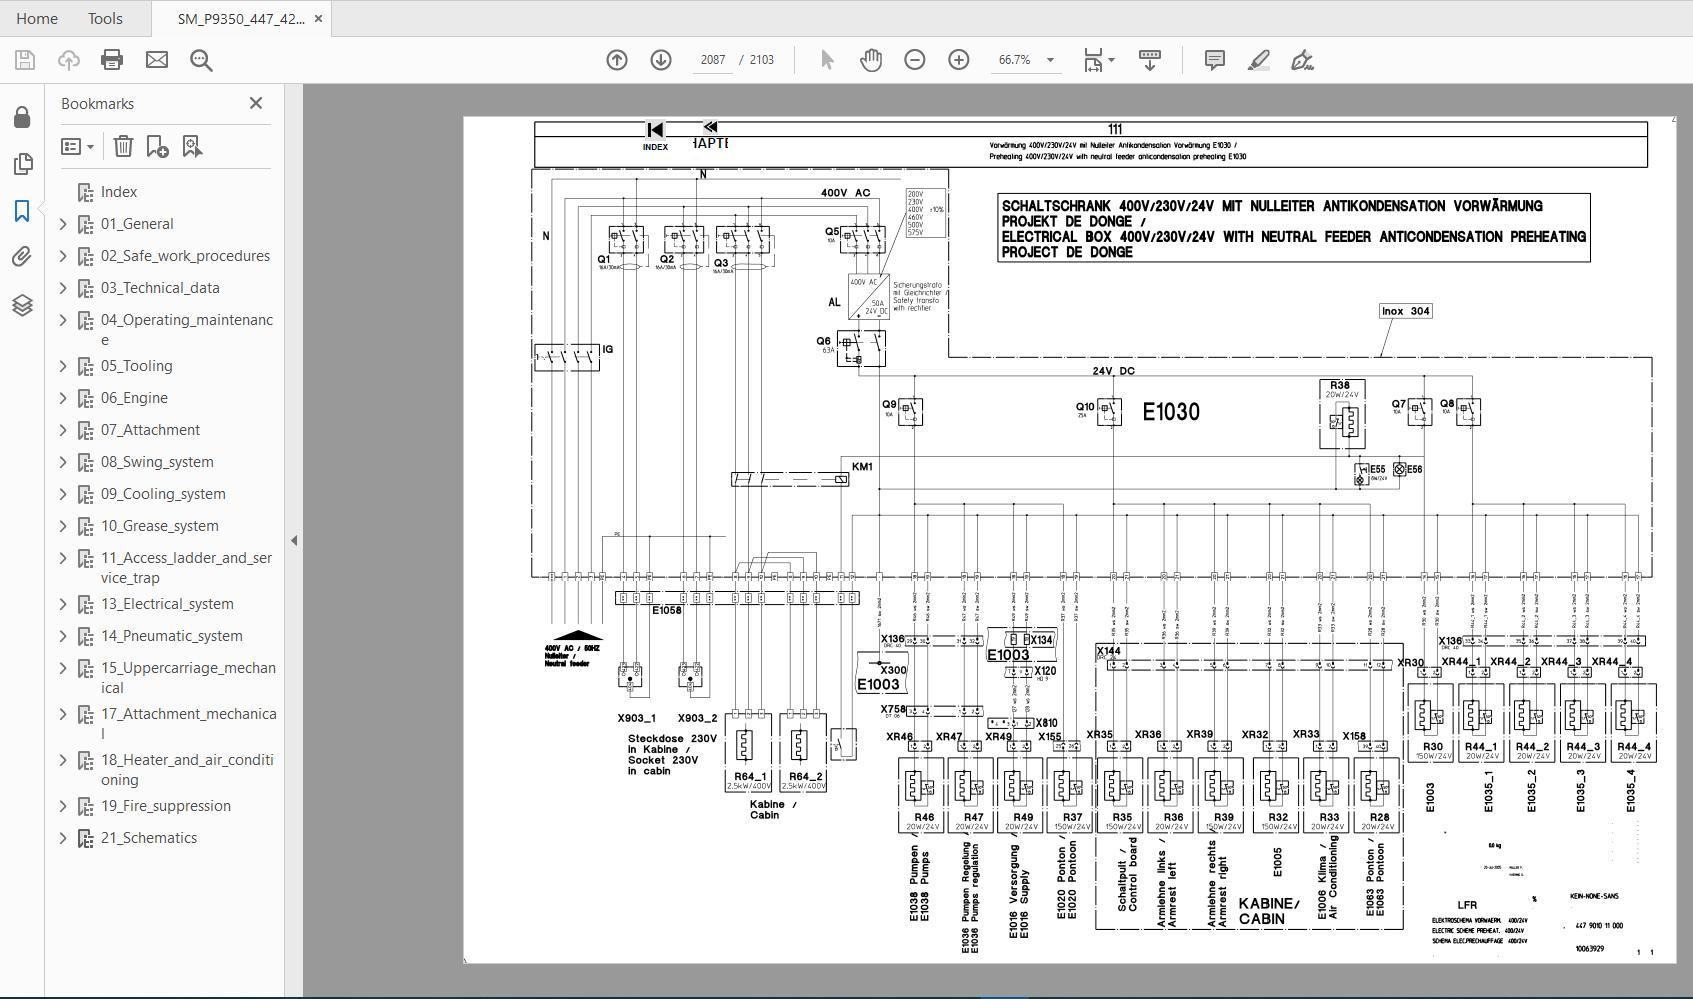 Liebherr_Mining_Excavators_Service_Manual_New_Updated_032020_17